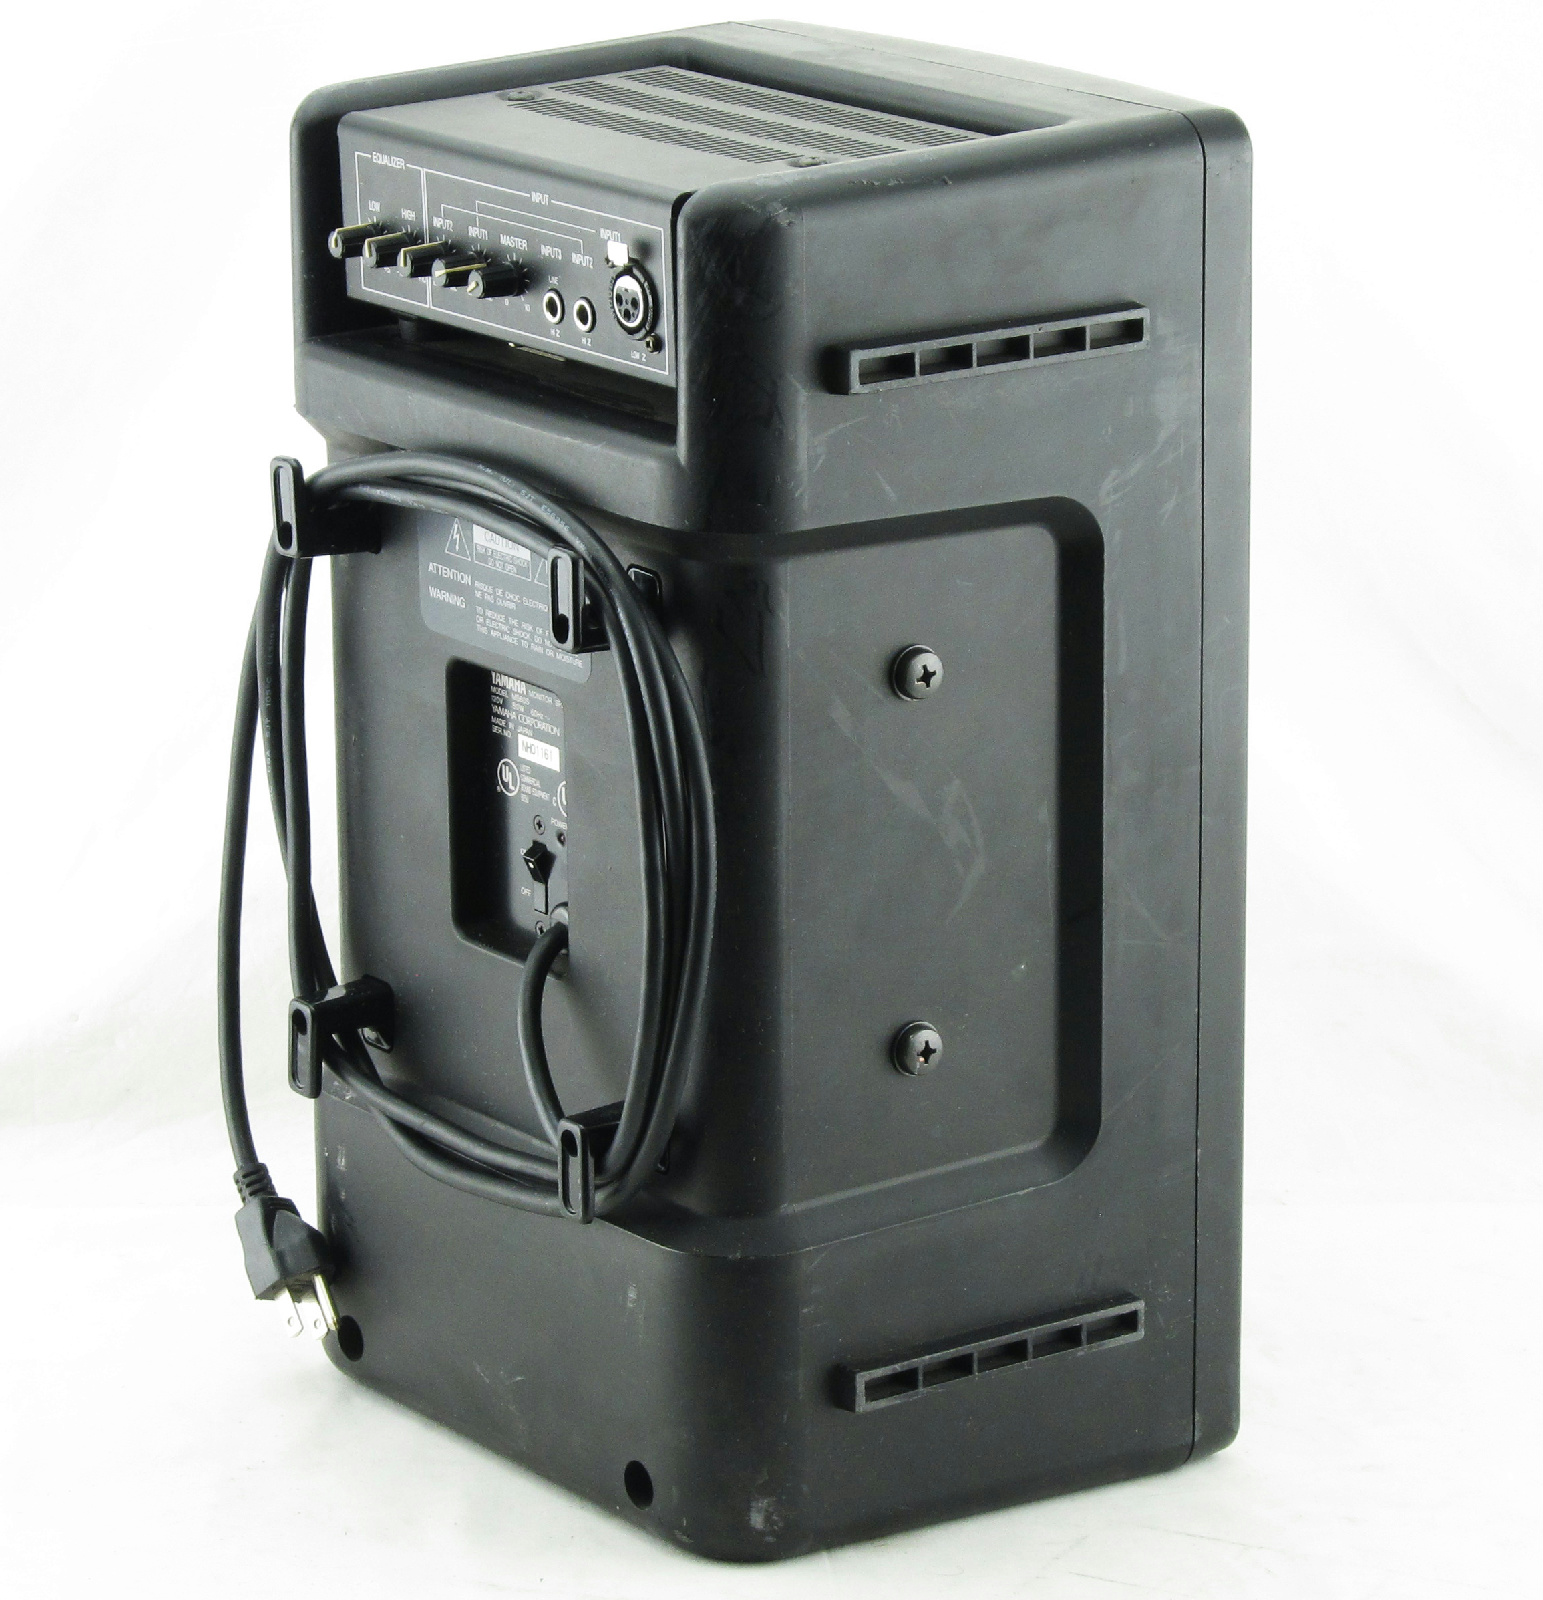 yamaha powered monitor speaker ms60s ebay. Black Bedroom Furniture Sets. Home Design Ideas